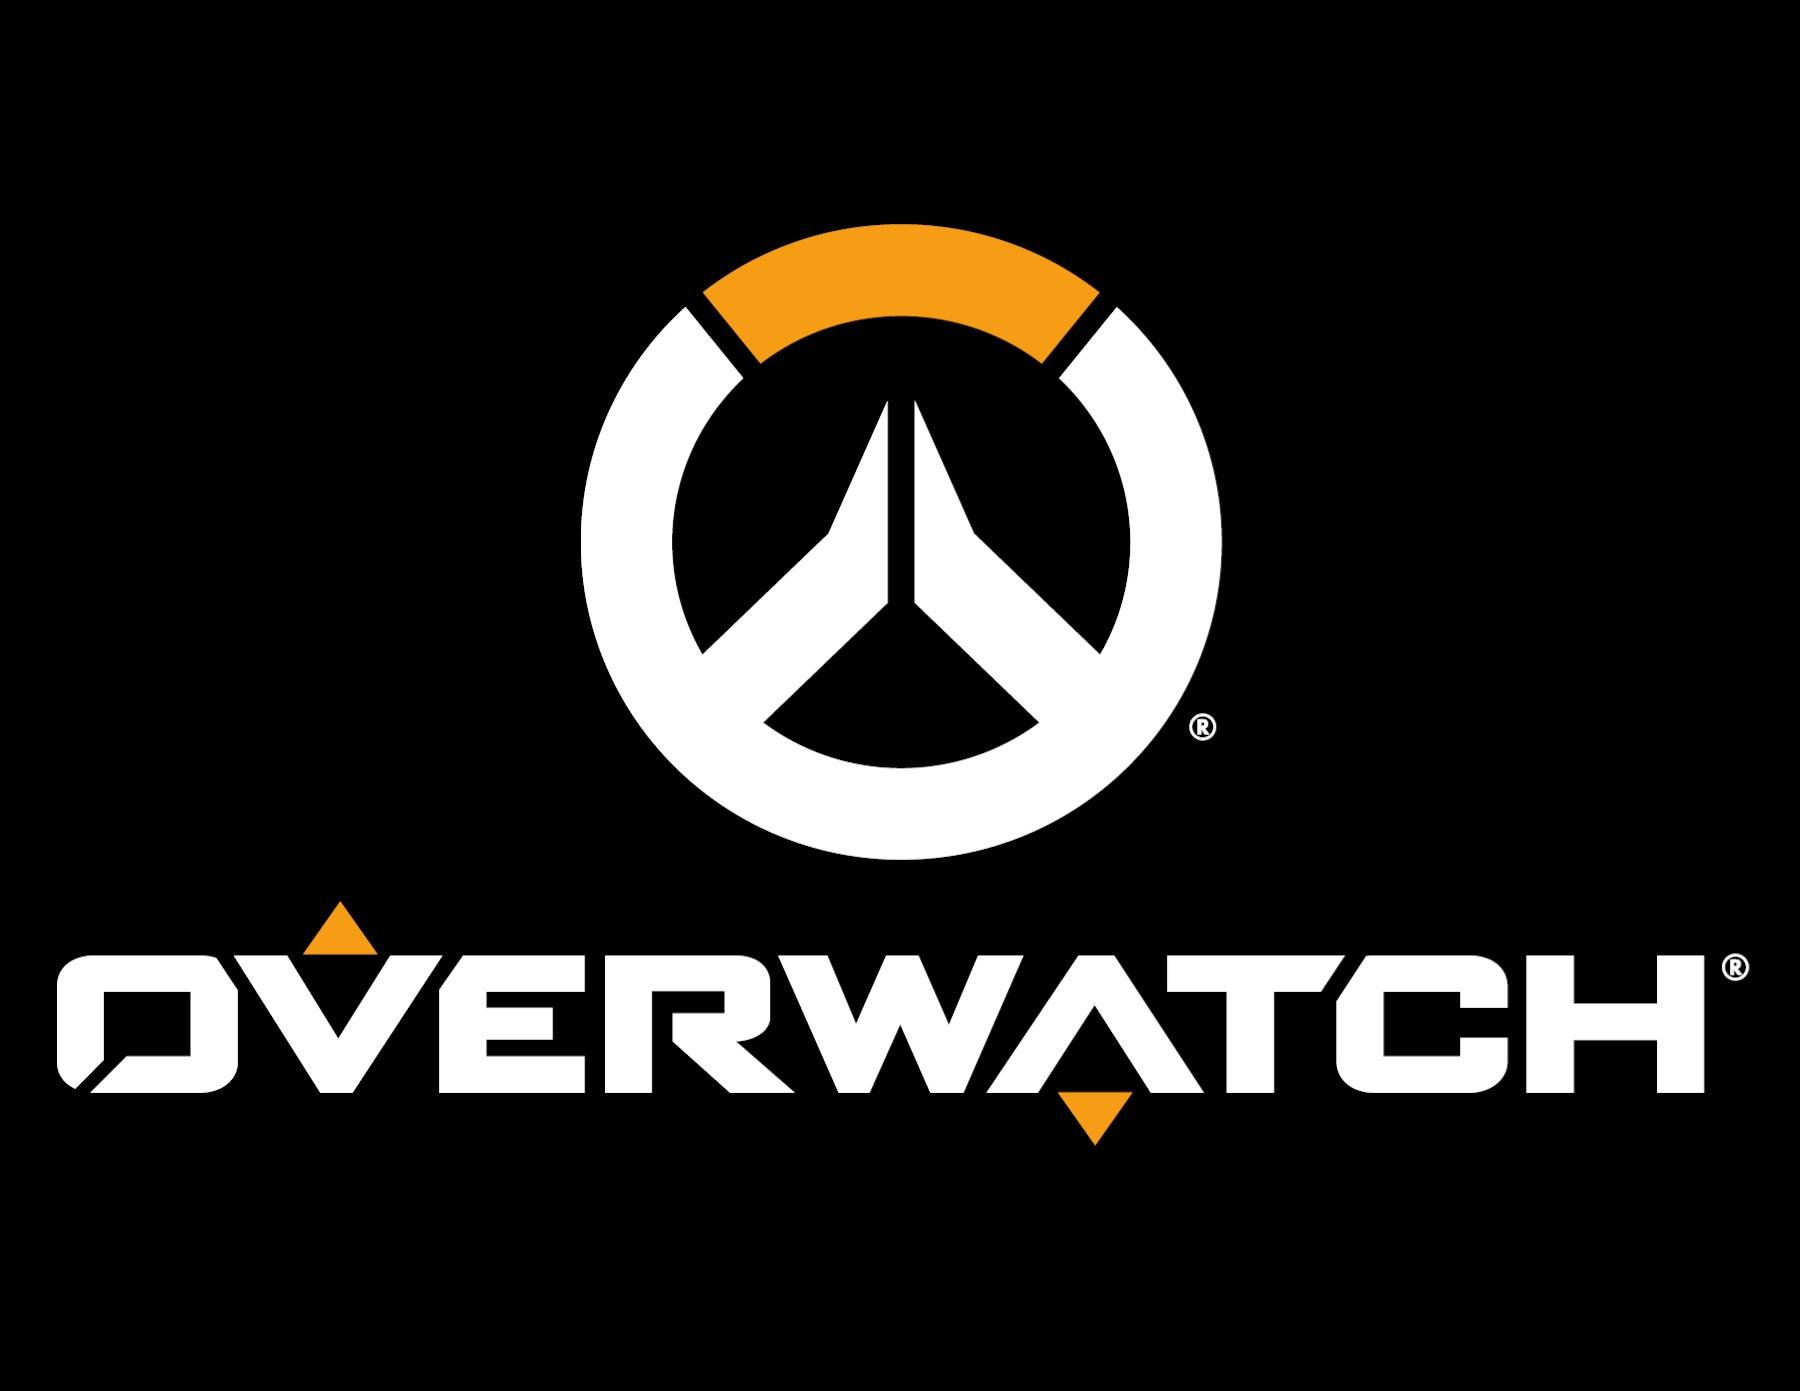 Overwatch(オーバーウォッチ)のロゴ